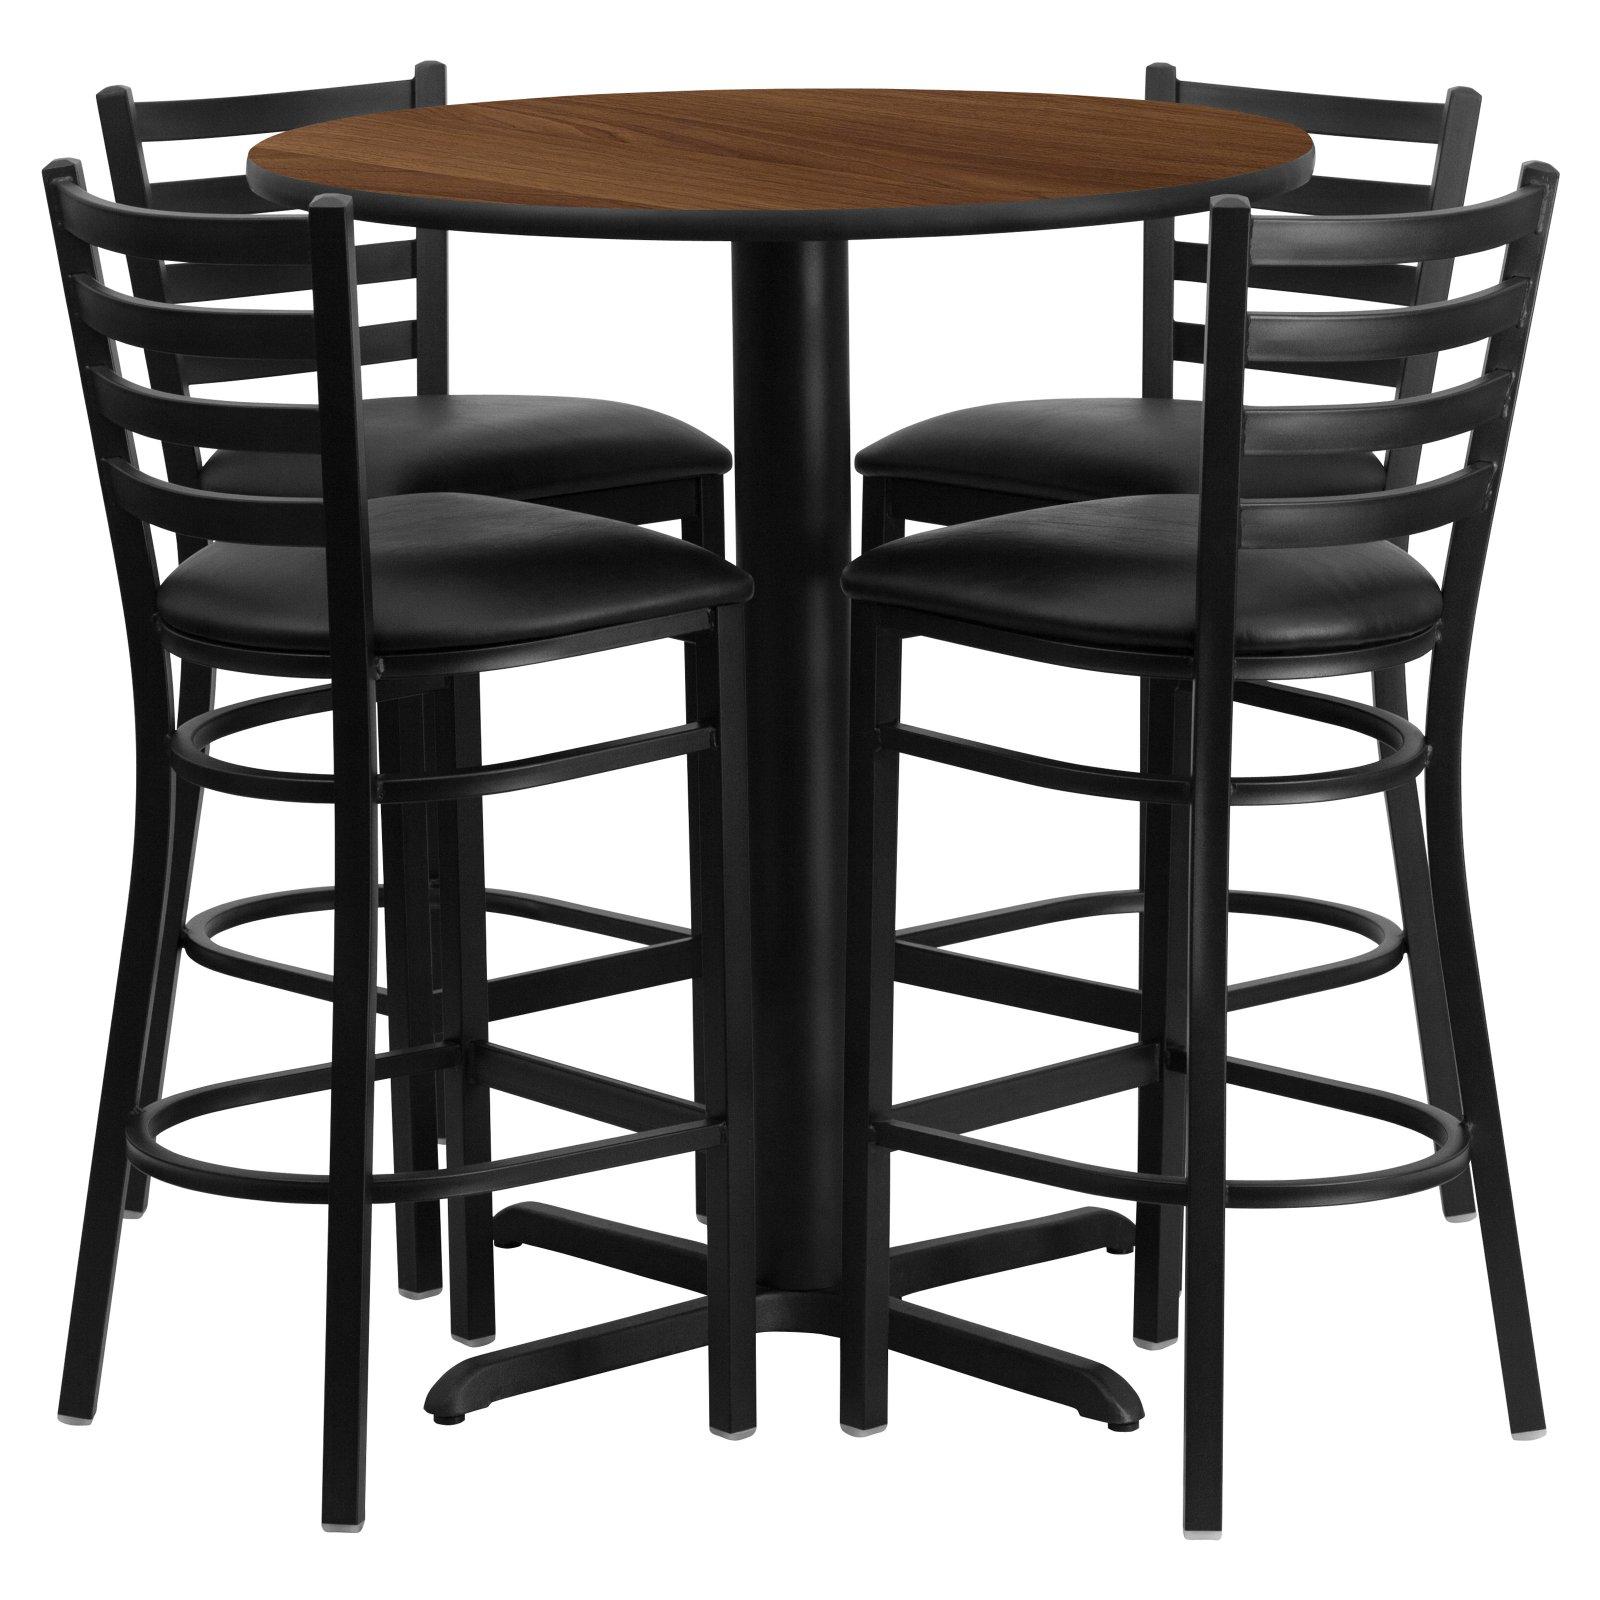 Flash Furniture 30'' Round Walnut Laminate Table Set with 4 Ladder Back Metal Barstools, Black Vinyl Seat Black, Walnut